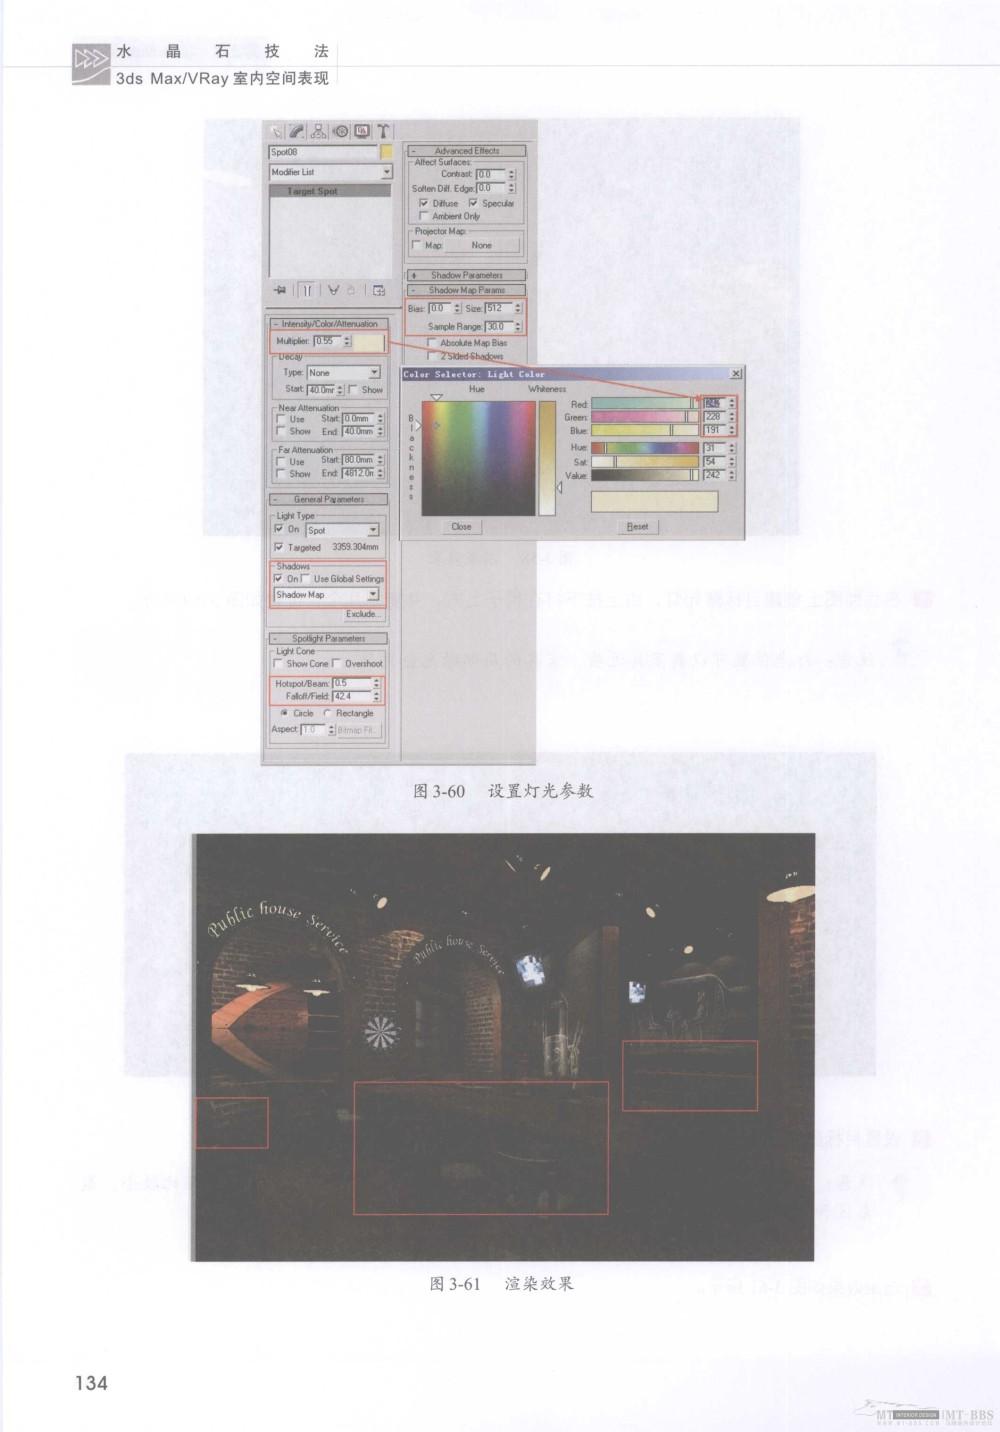 水晶石技法-3ds_Max&VRay室内空间表现_水晶石技法-3ds_Max&VRay室内空间表现_页面_140.jpg